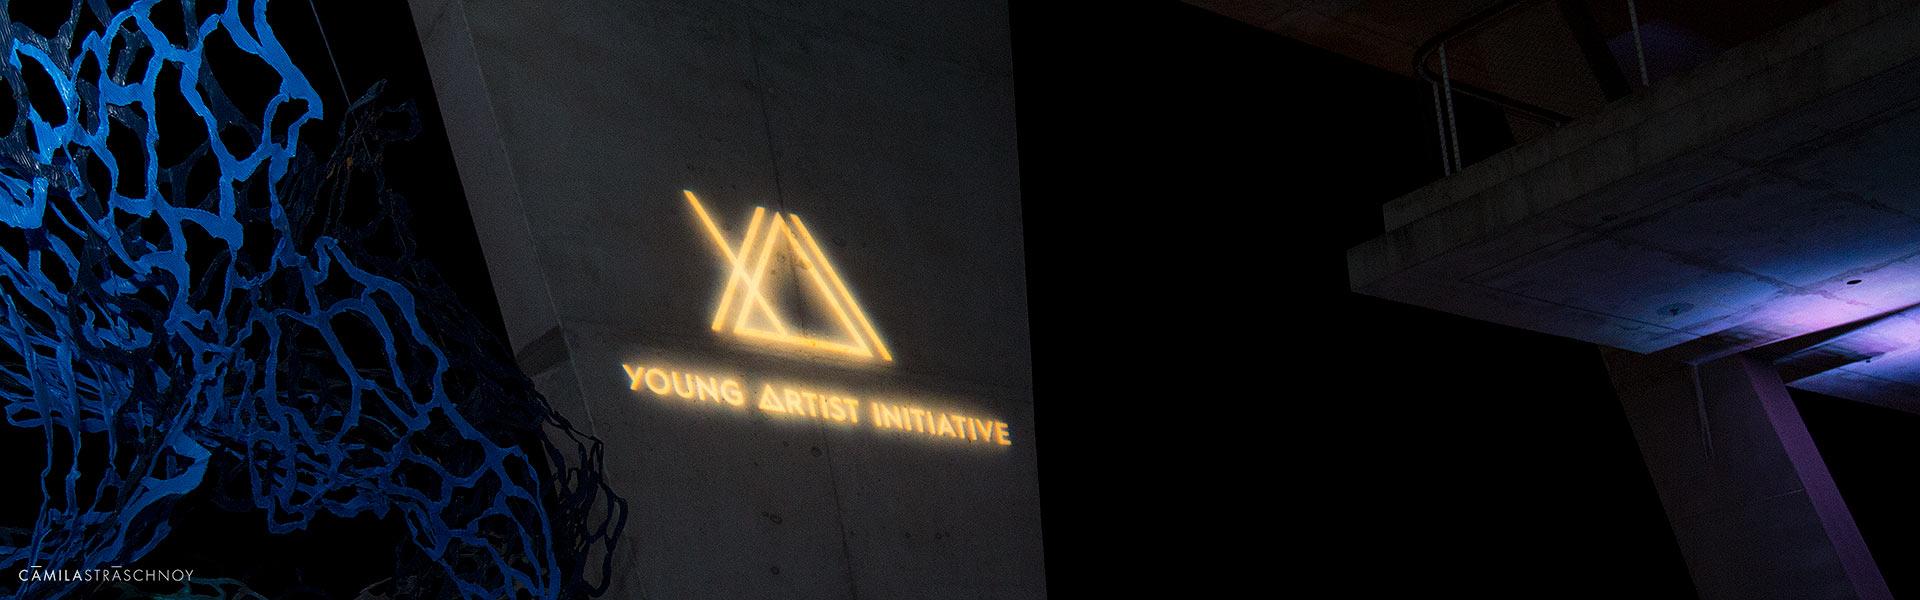 Young Artist Initiative in Miami Beach